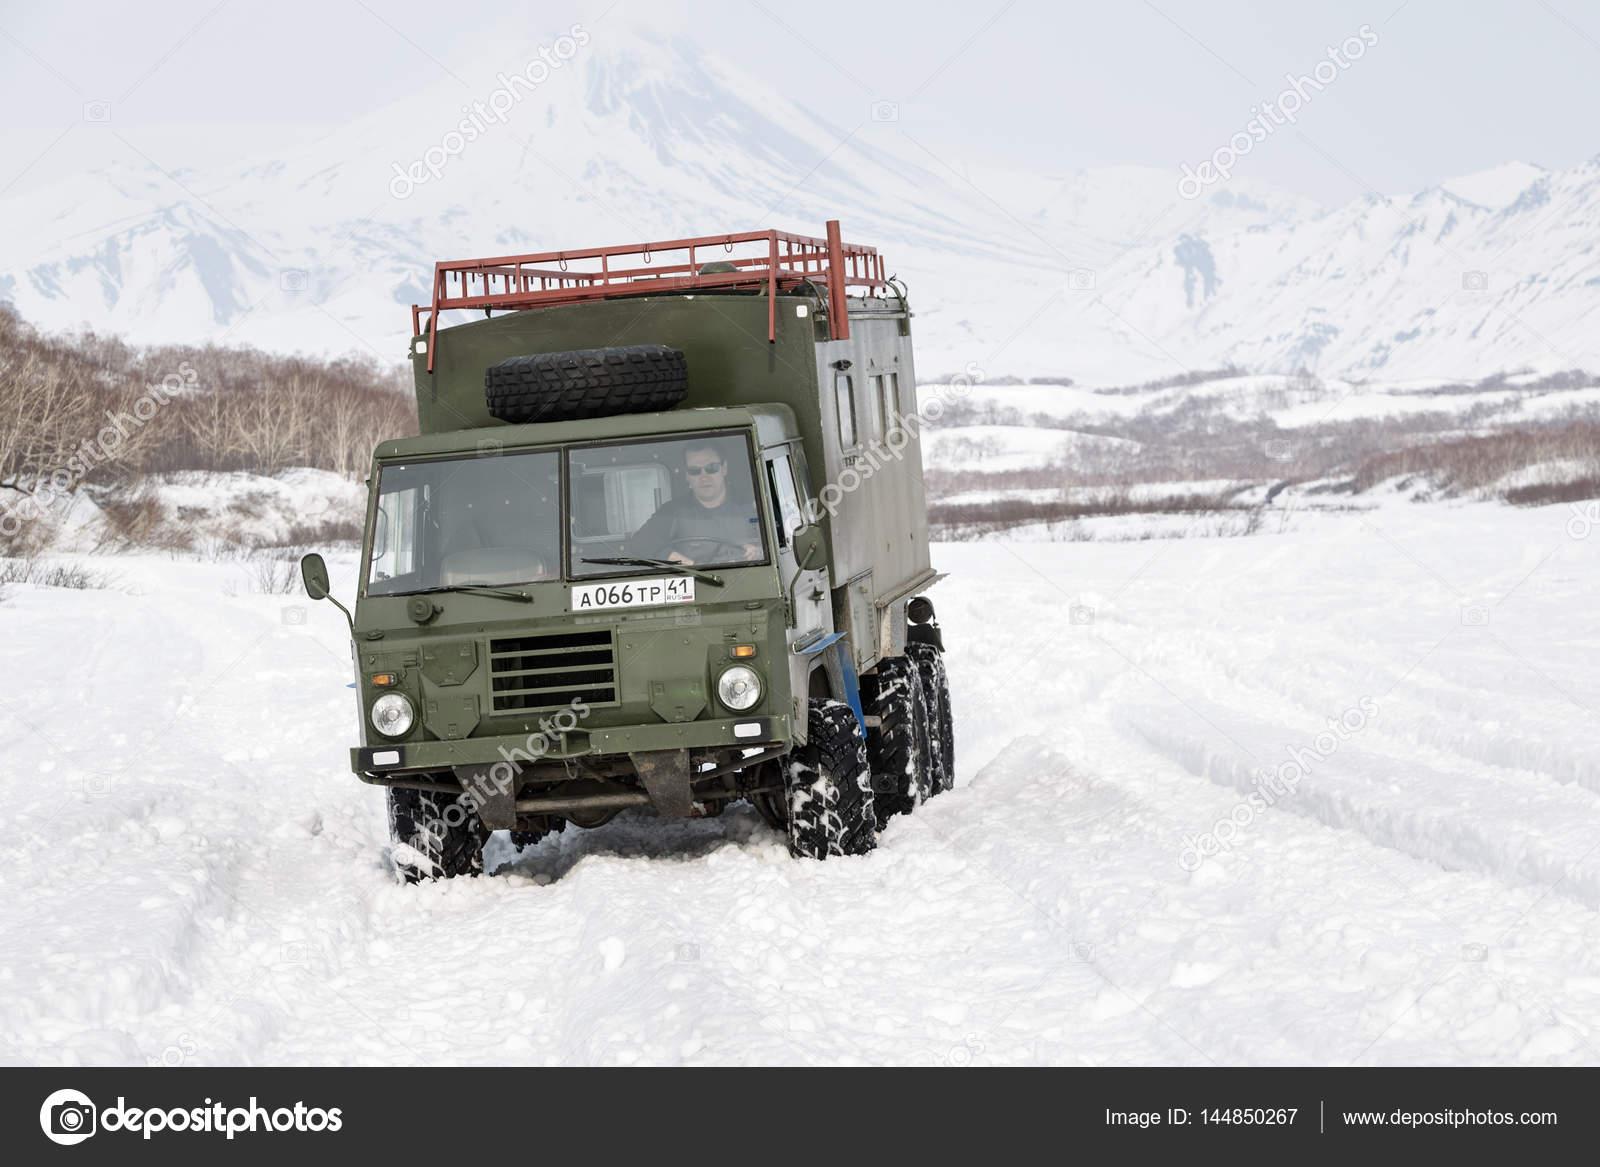 Topnotch Szwedzki stare wojskowe Samochody terenowe Volvo Laplander C304 FP29